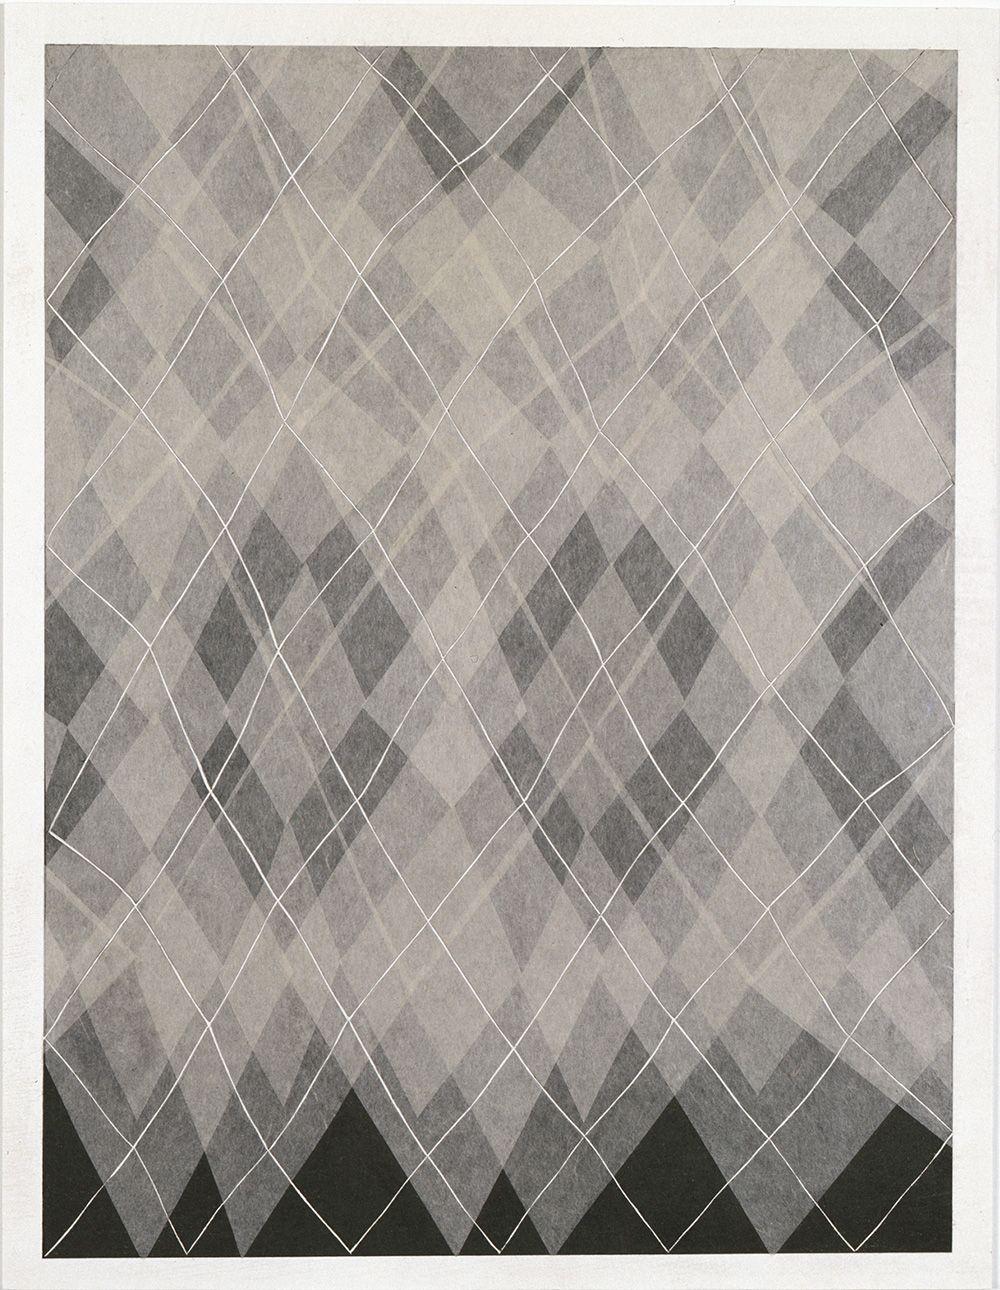 Takuji Hamanaka Argyle, 2008 Japanese woodcut with Gampi paper collage 12 1/4 x 10 in. / 31.1 x 25.4 cm.